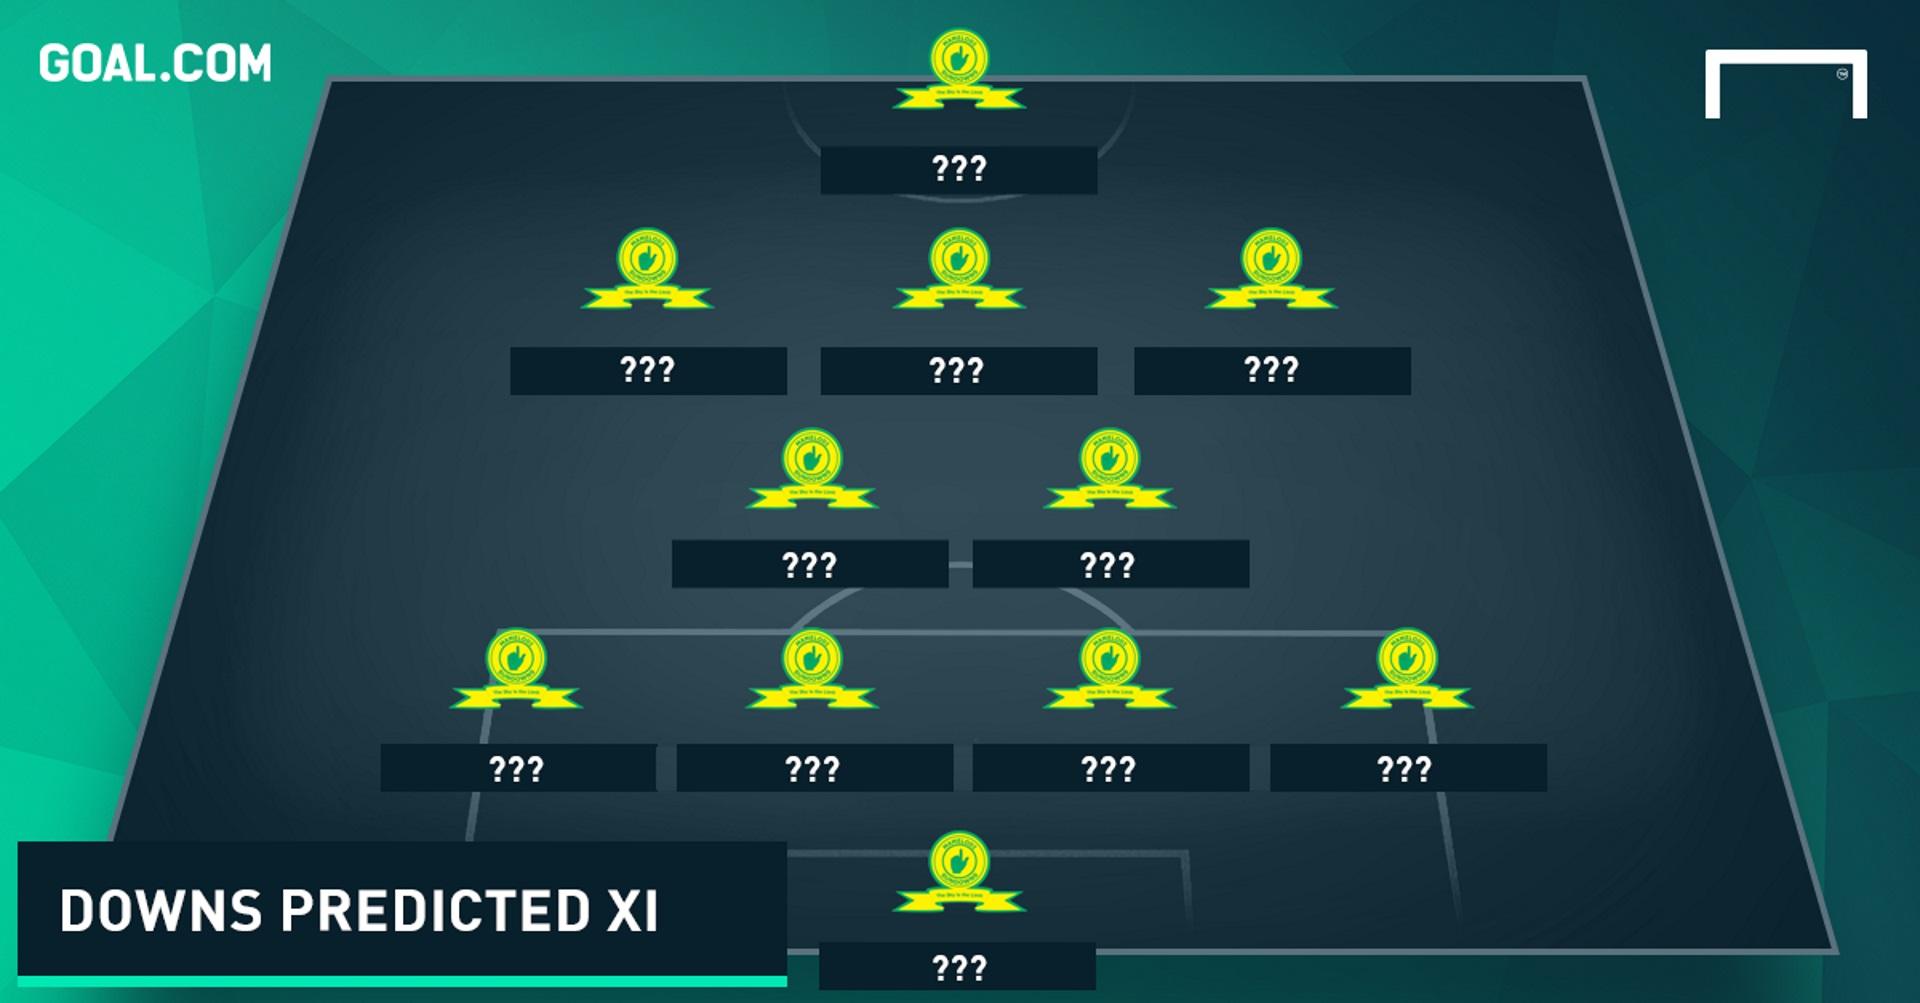 Mamelodi Sundowns Mystery XI vs Kaizer Chiefs - Goal.com